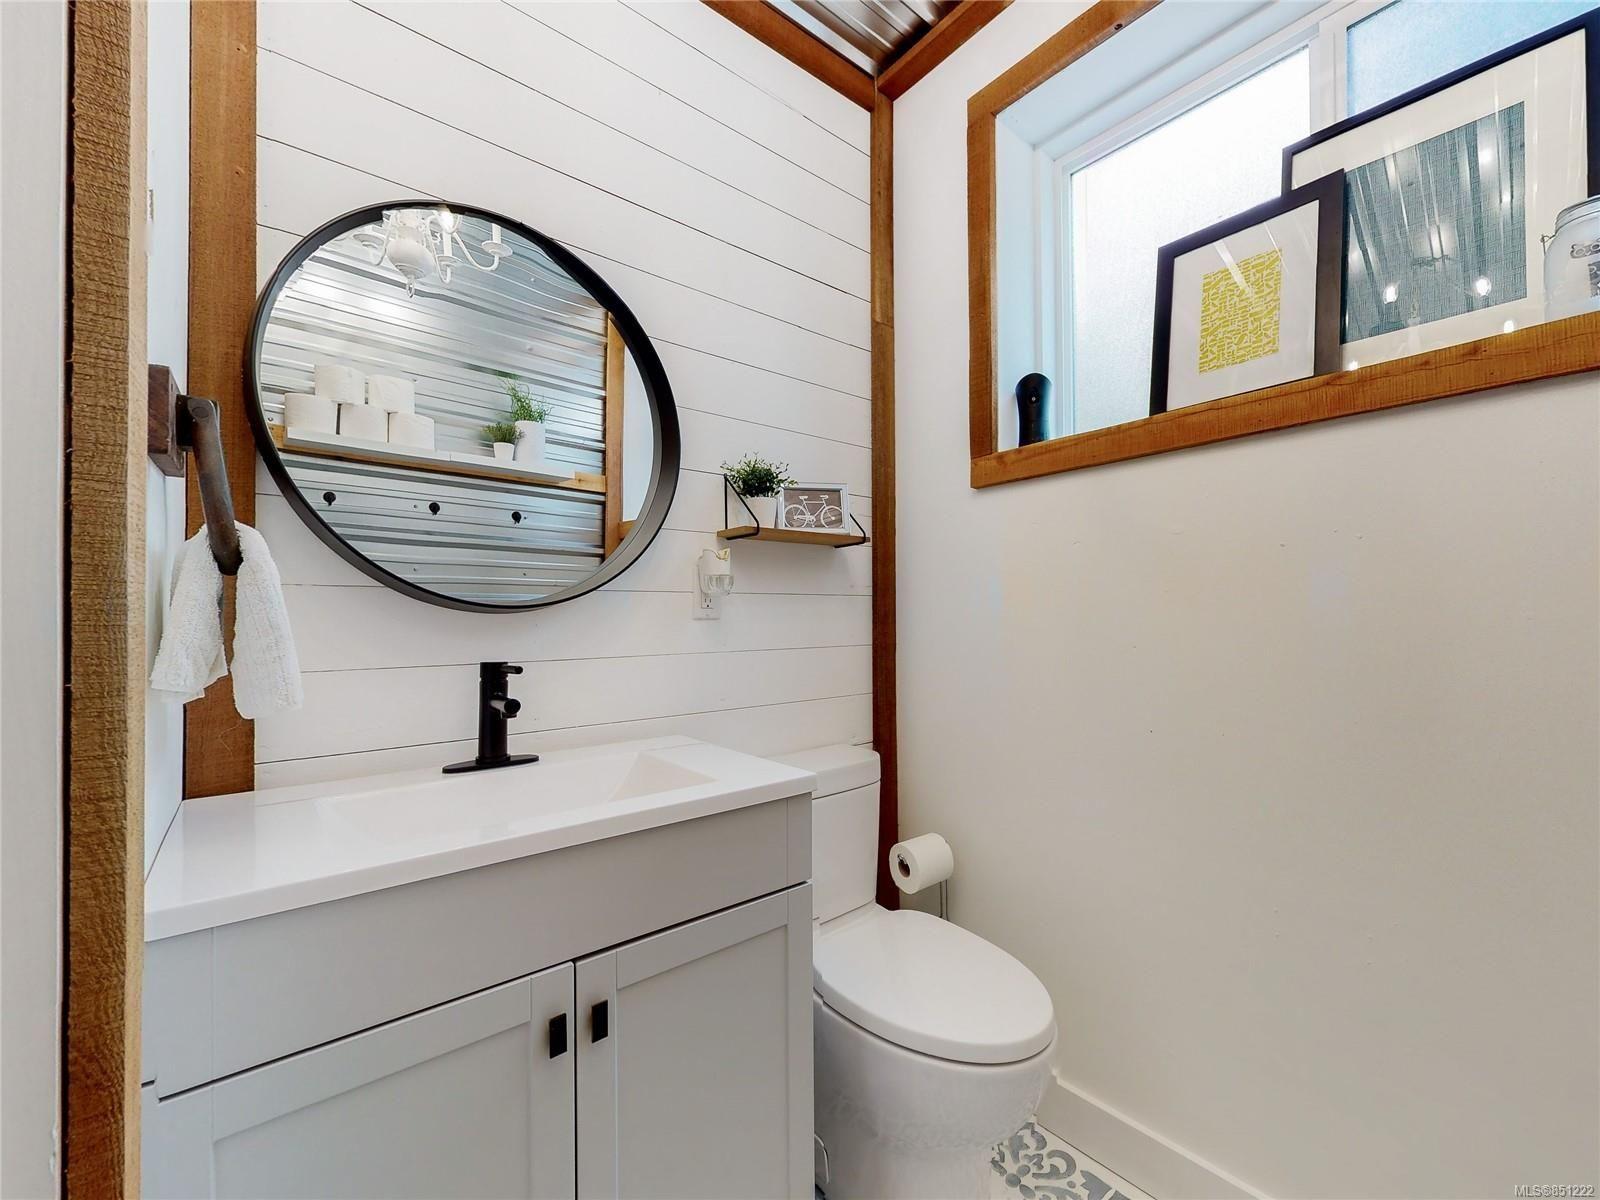 Photo 25: Photos: 2525 11th Ave in : PA Port Alberni House for sale (Port Alberni)  : MLS®# 851222